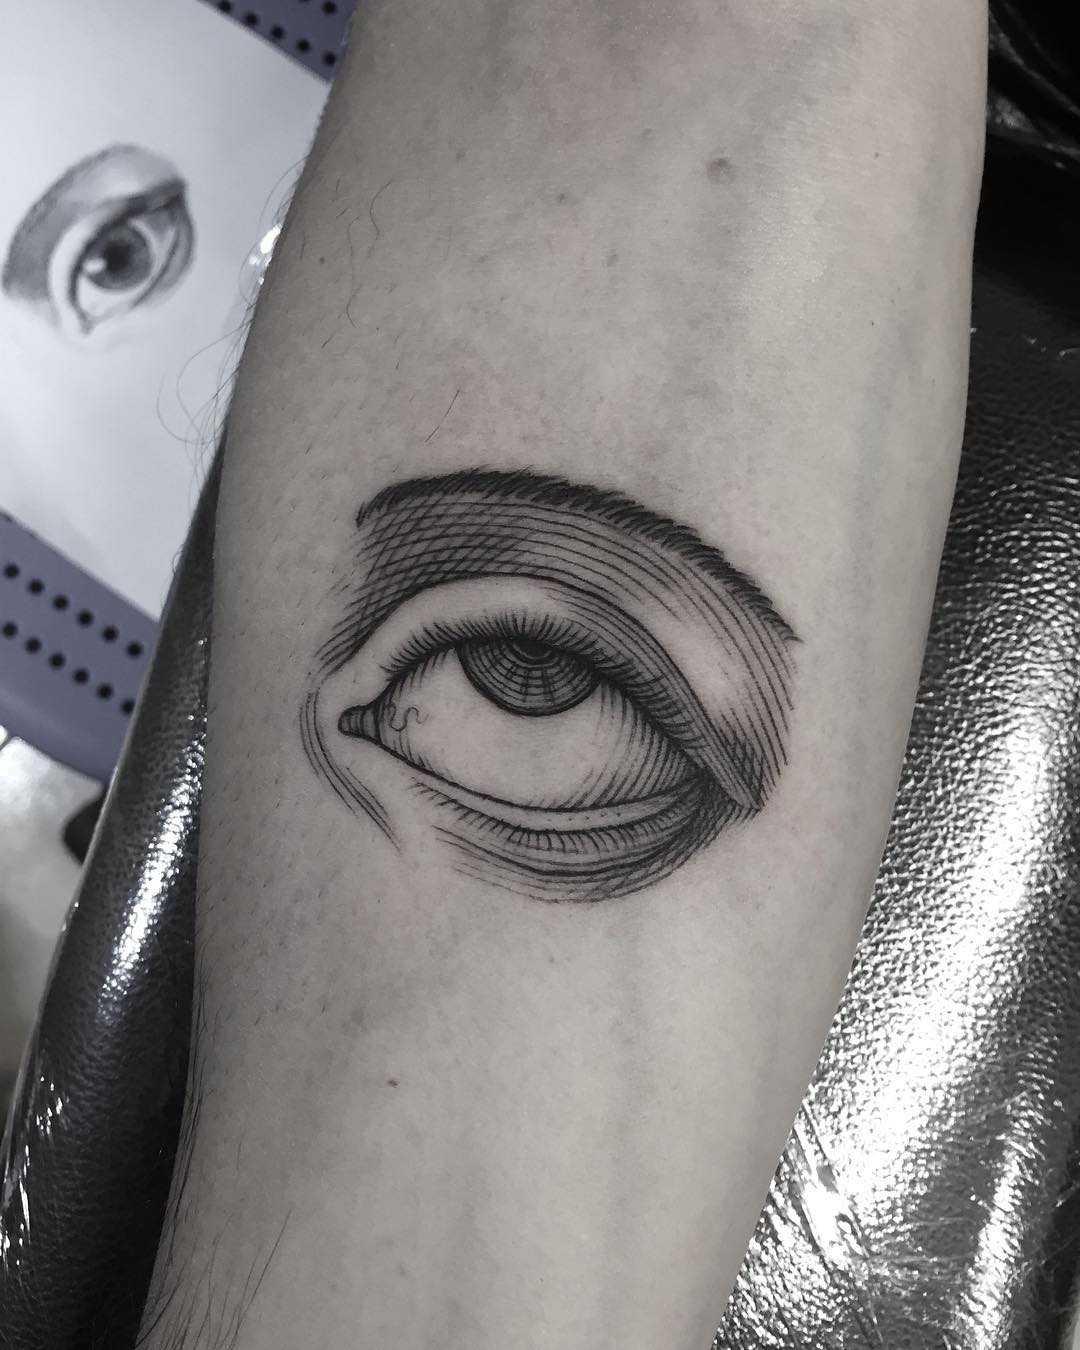 Etching eye tattoo done at Primordial Pain Tattoo, Milano